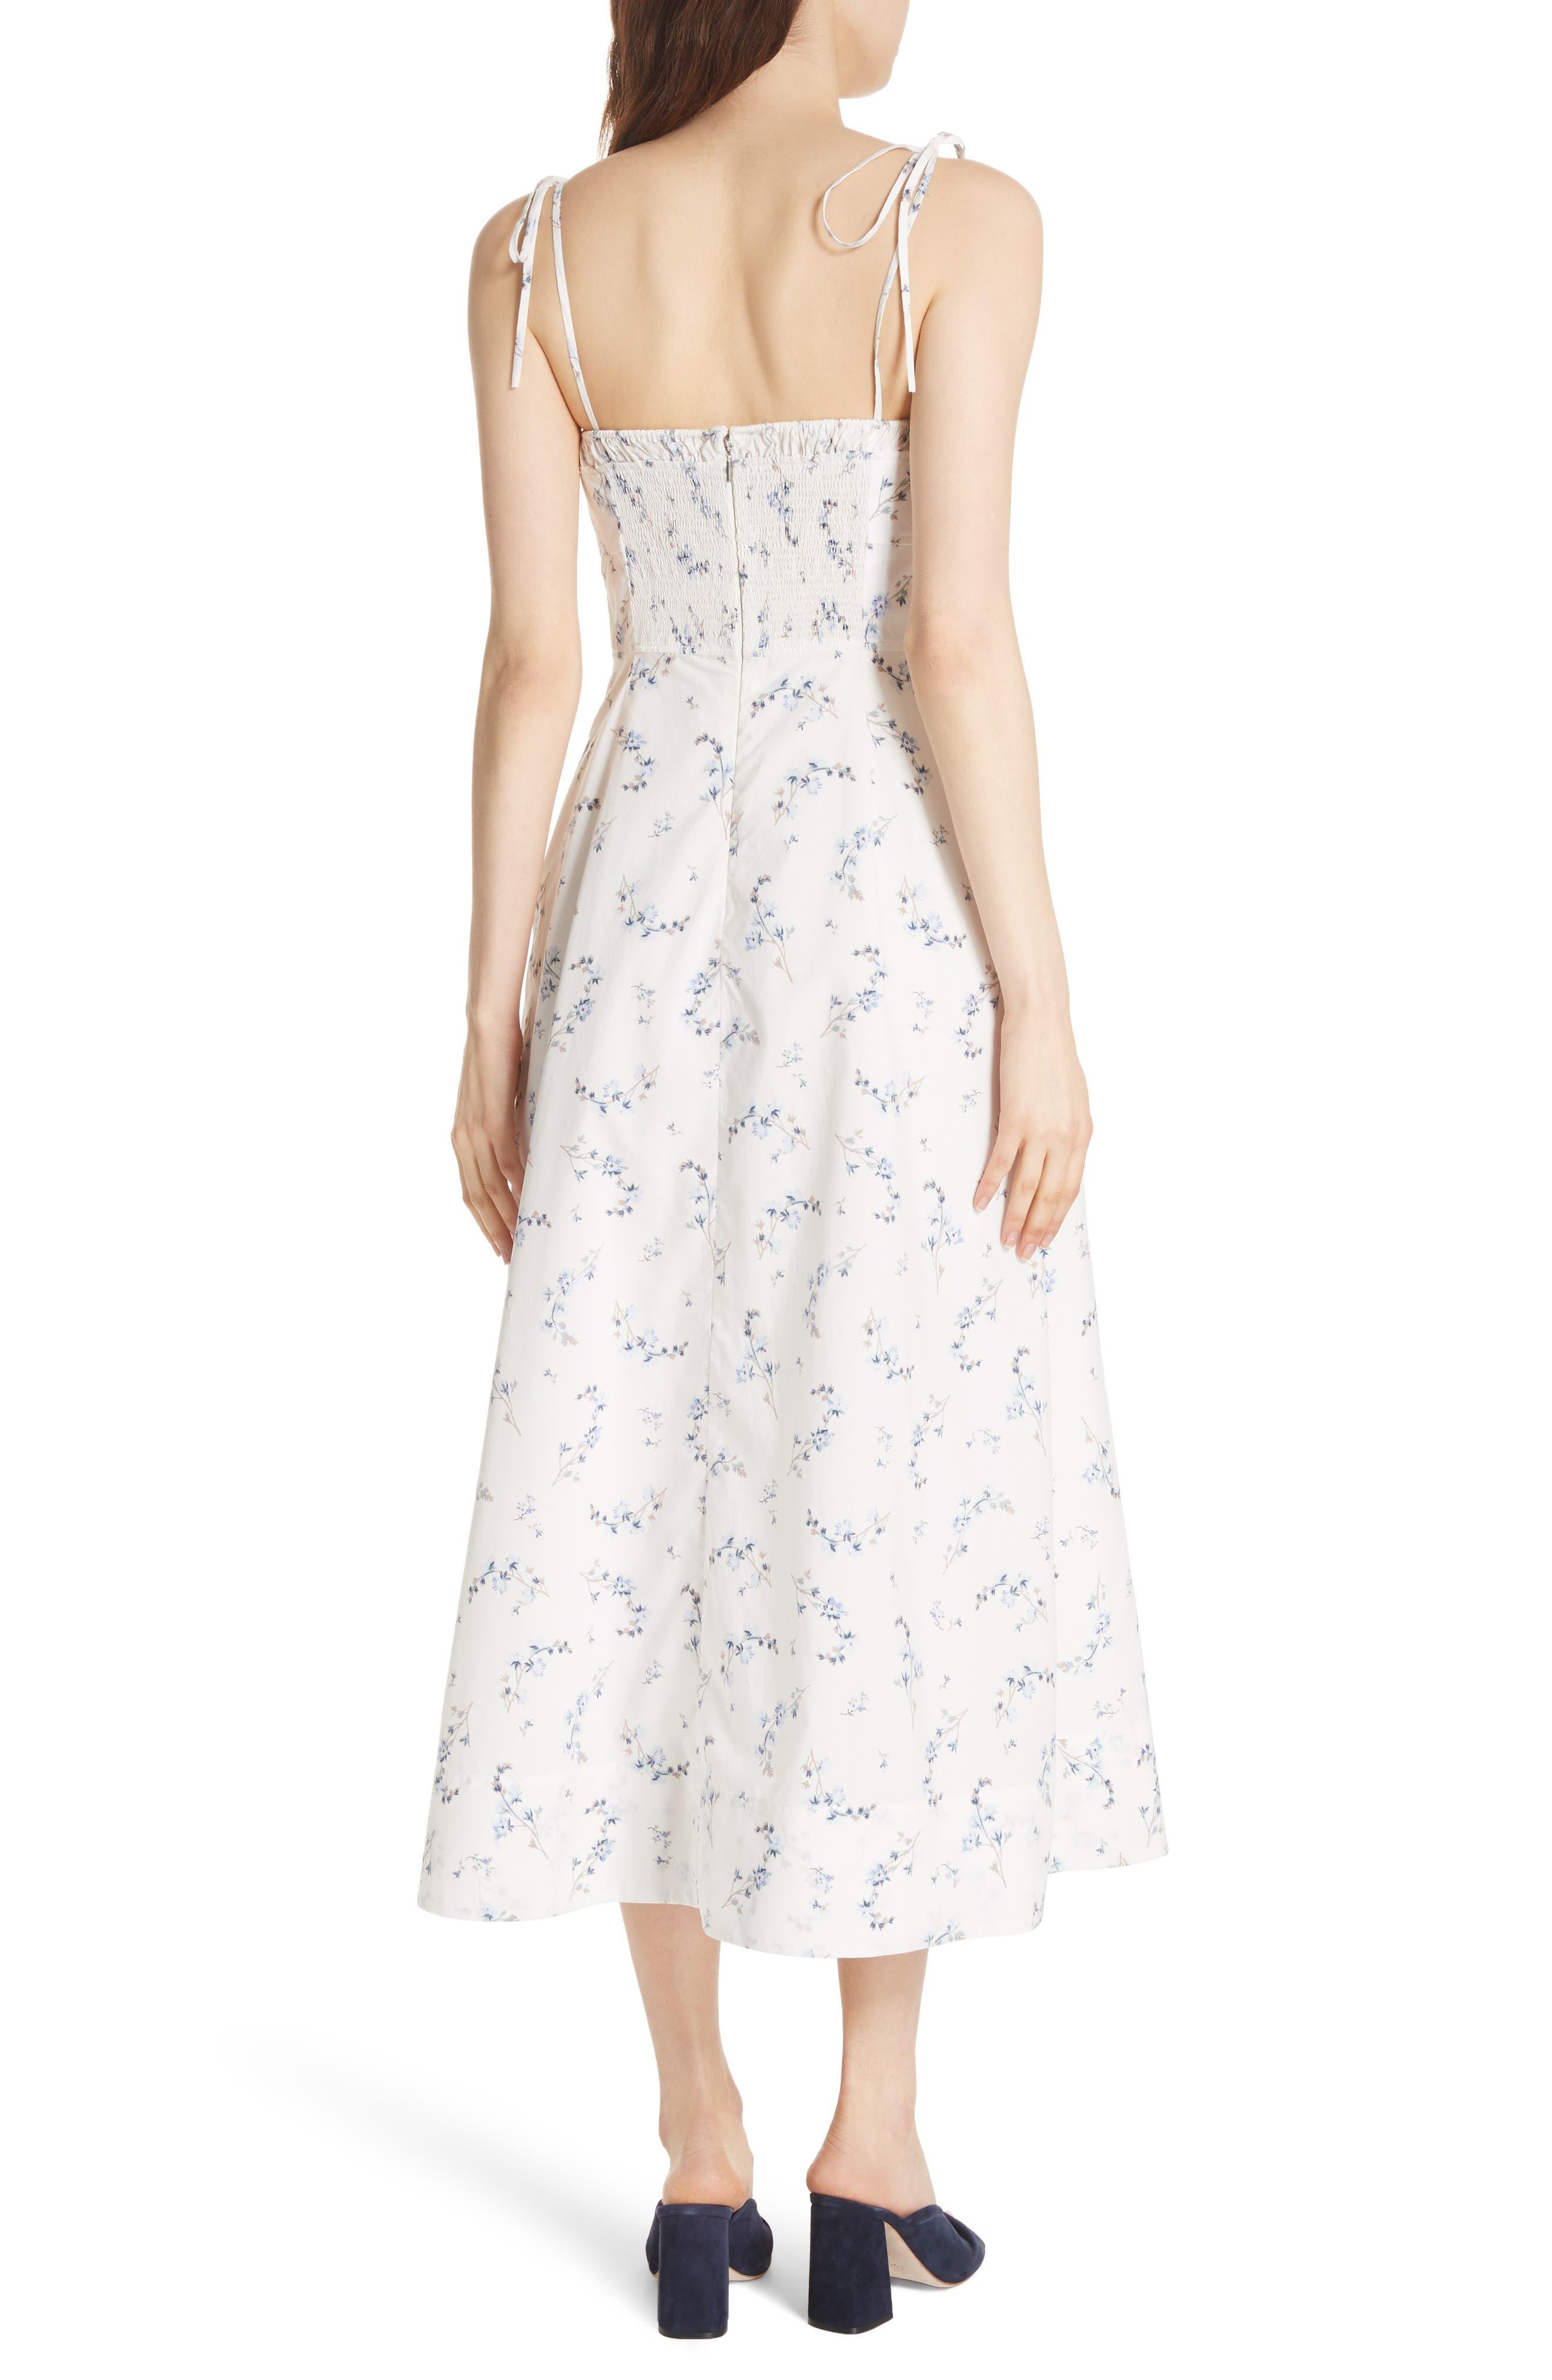 Francine Floral Cotton Poplin Dress,                             Alternate thumbnail 2, color,                             103